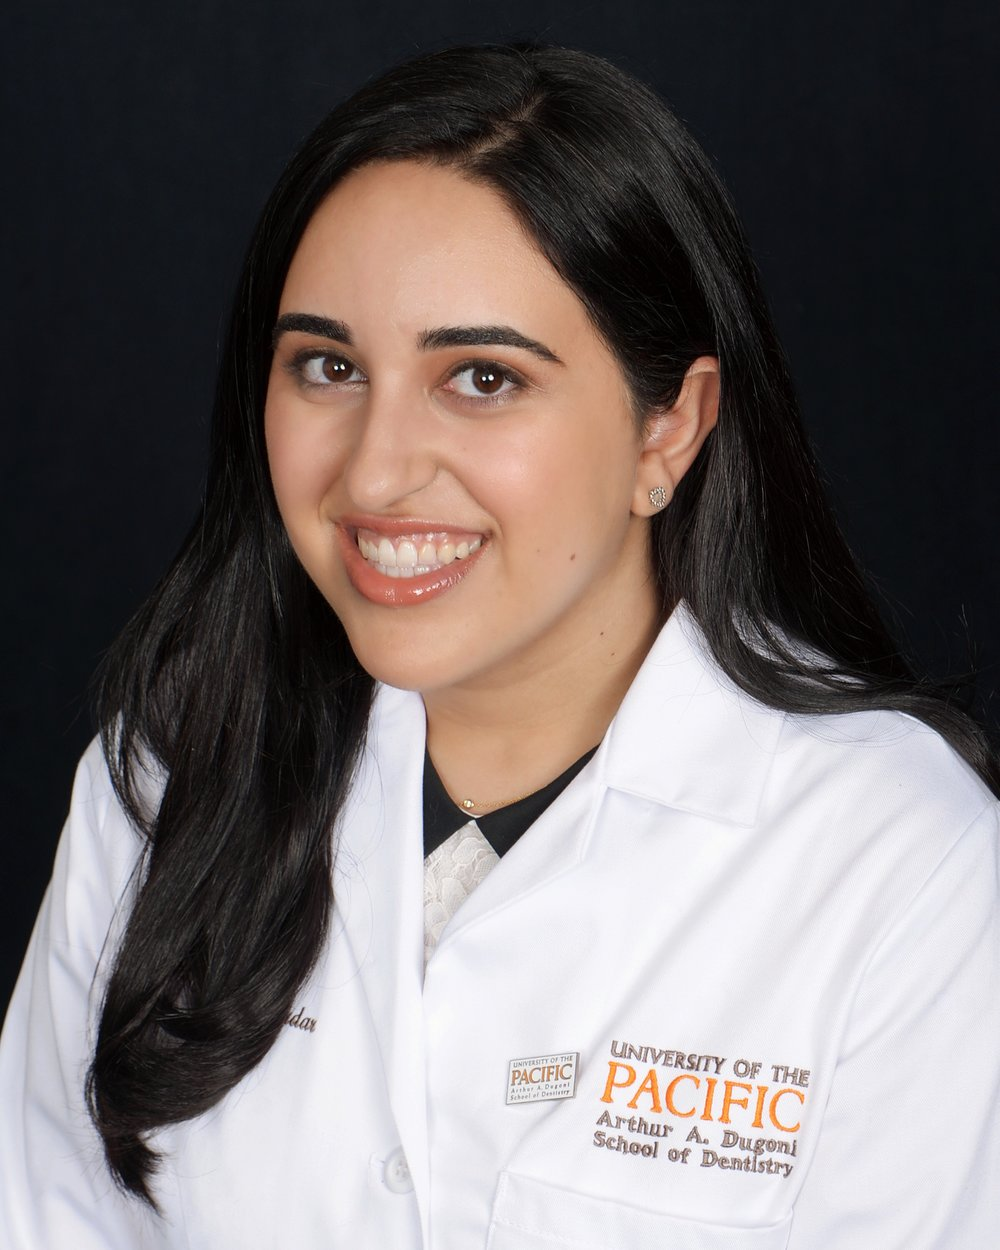 Dr. Nelia Barkhordar, DDS